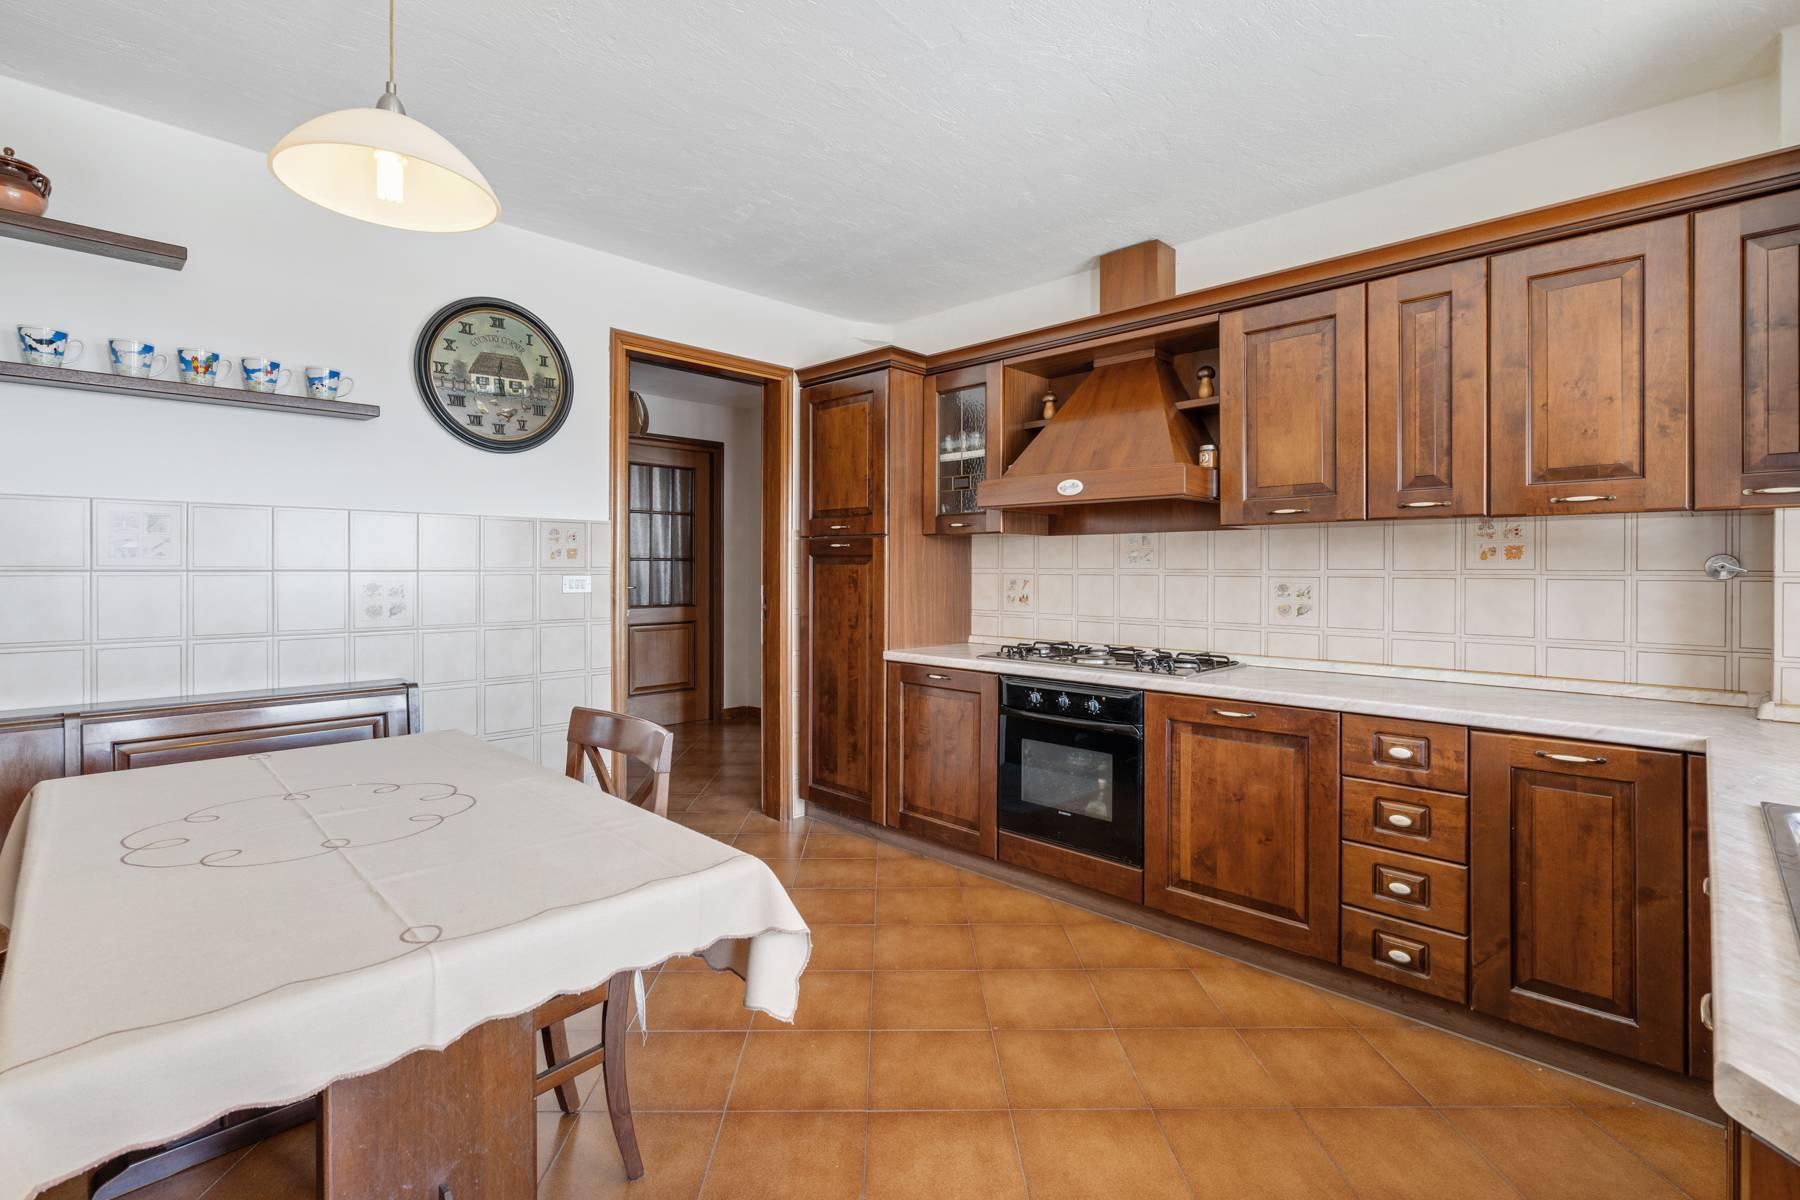 Villa in Vendita a Baldissero Torinese: 5 locali, 503 mq - Foto 18